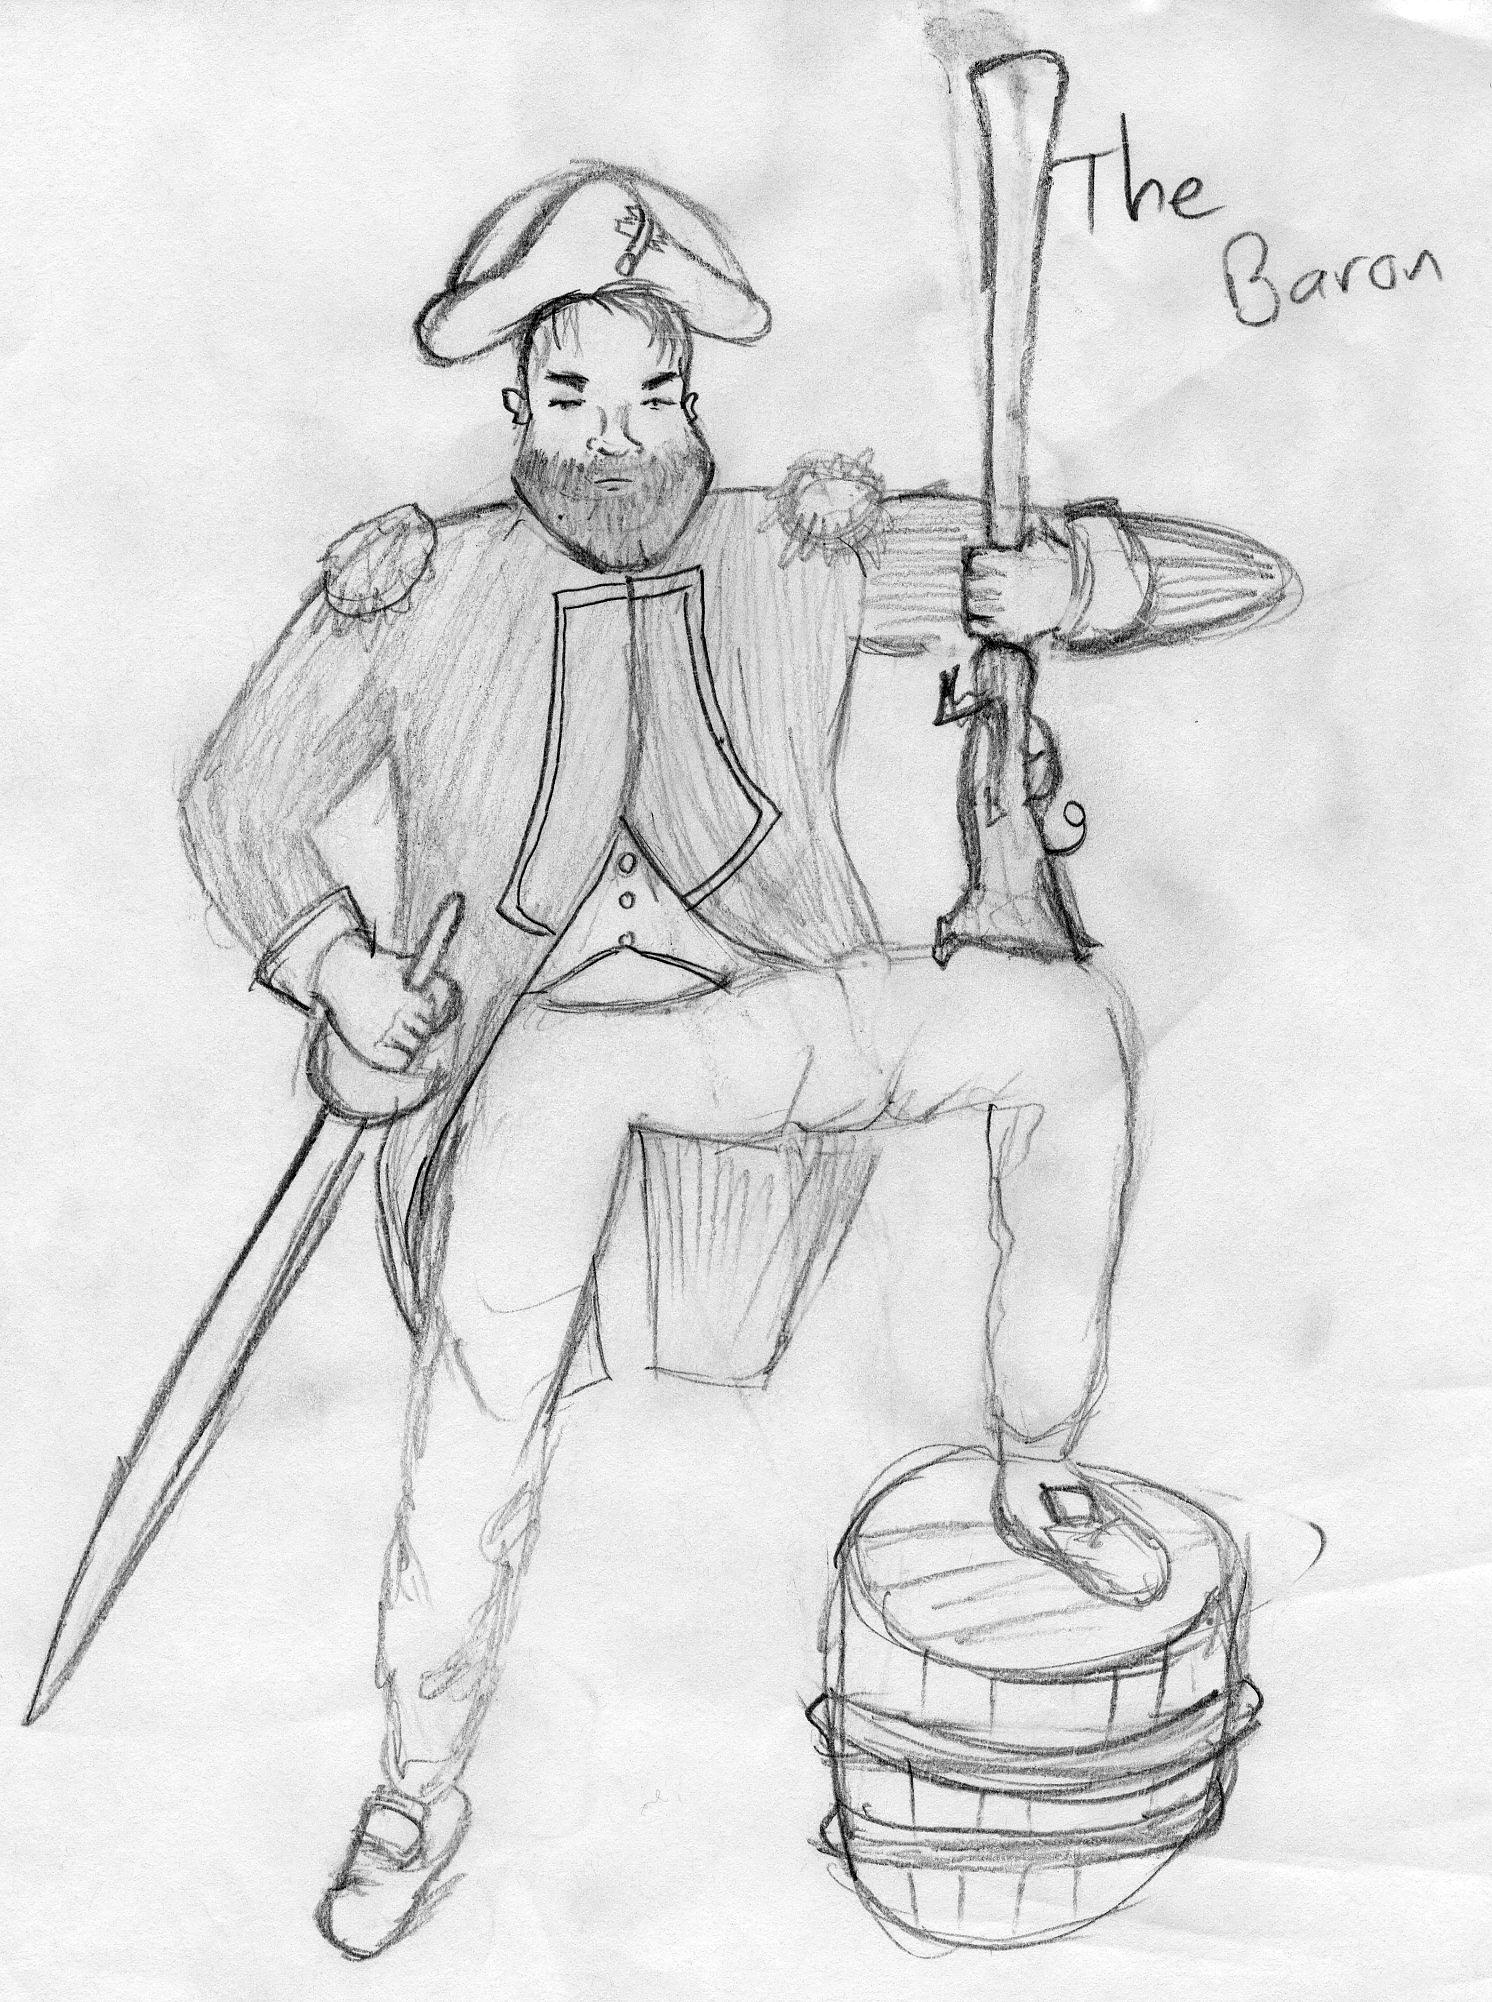 -Three Pirates- The Baron